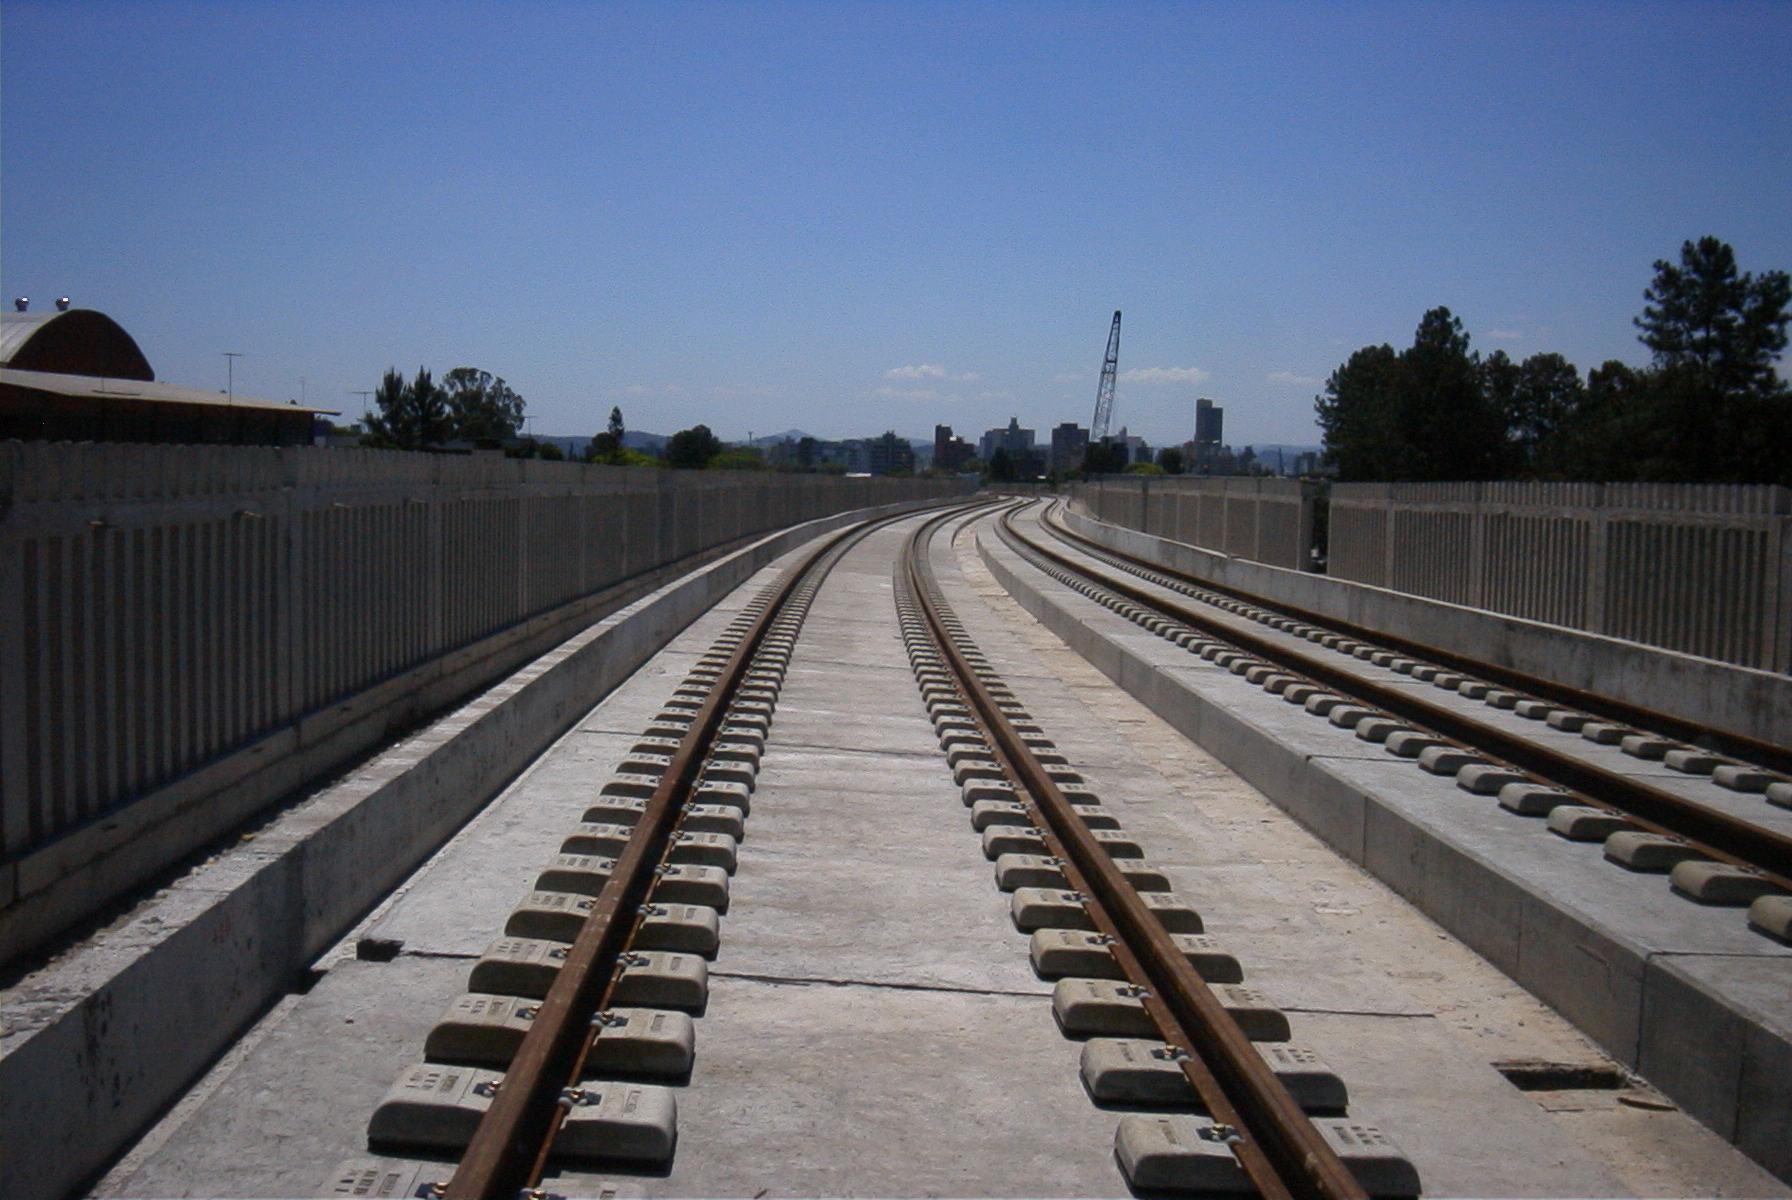 Dorbras raudtee kinnitusdetailid